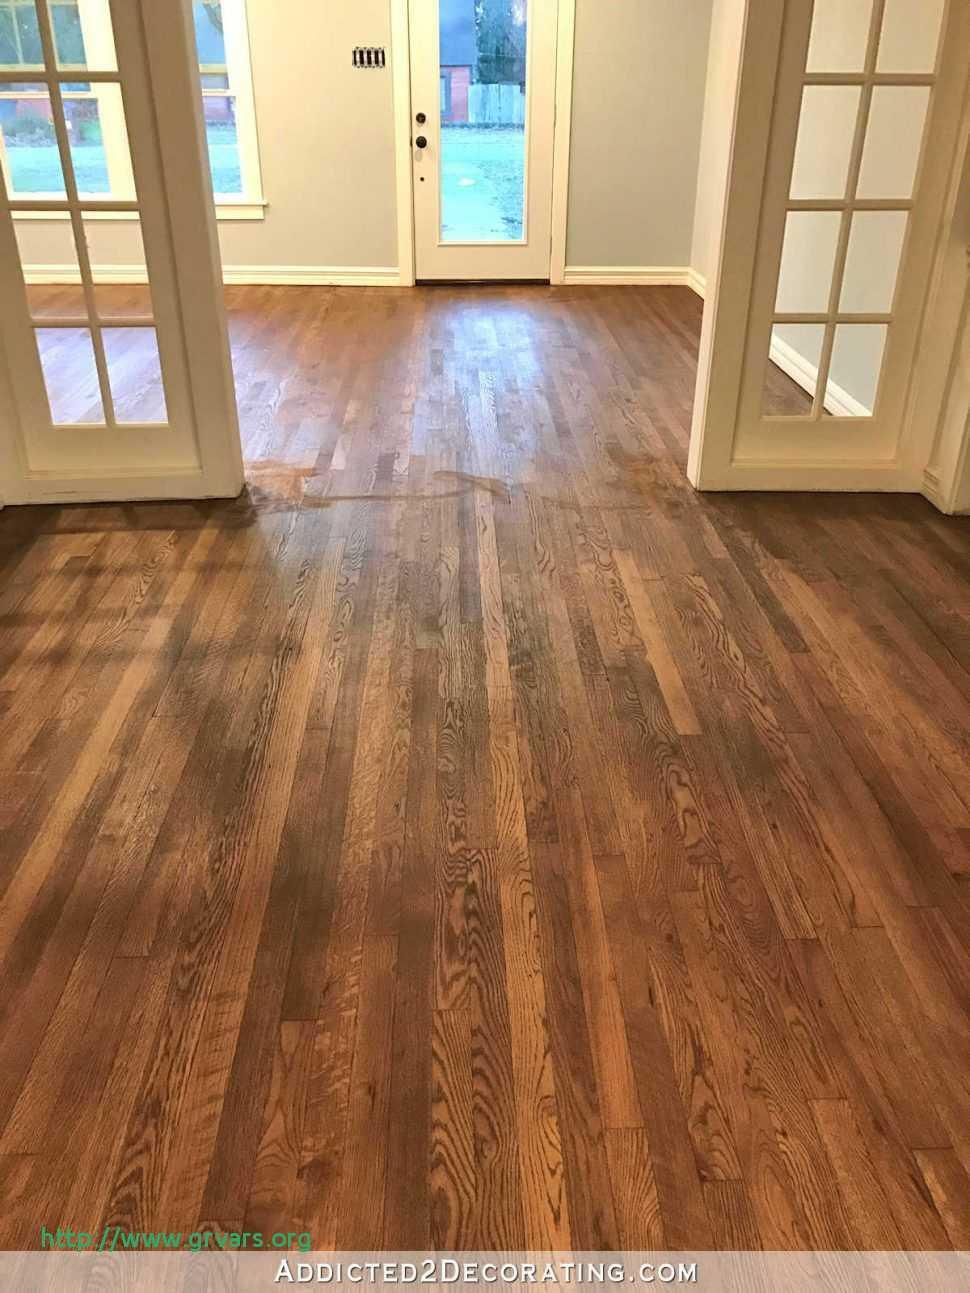 28 Popular Cost To Refinish Hardwood Floors Los Angeles